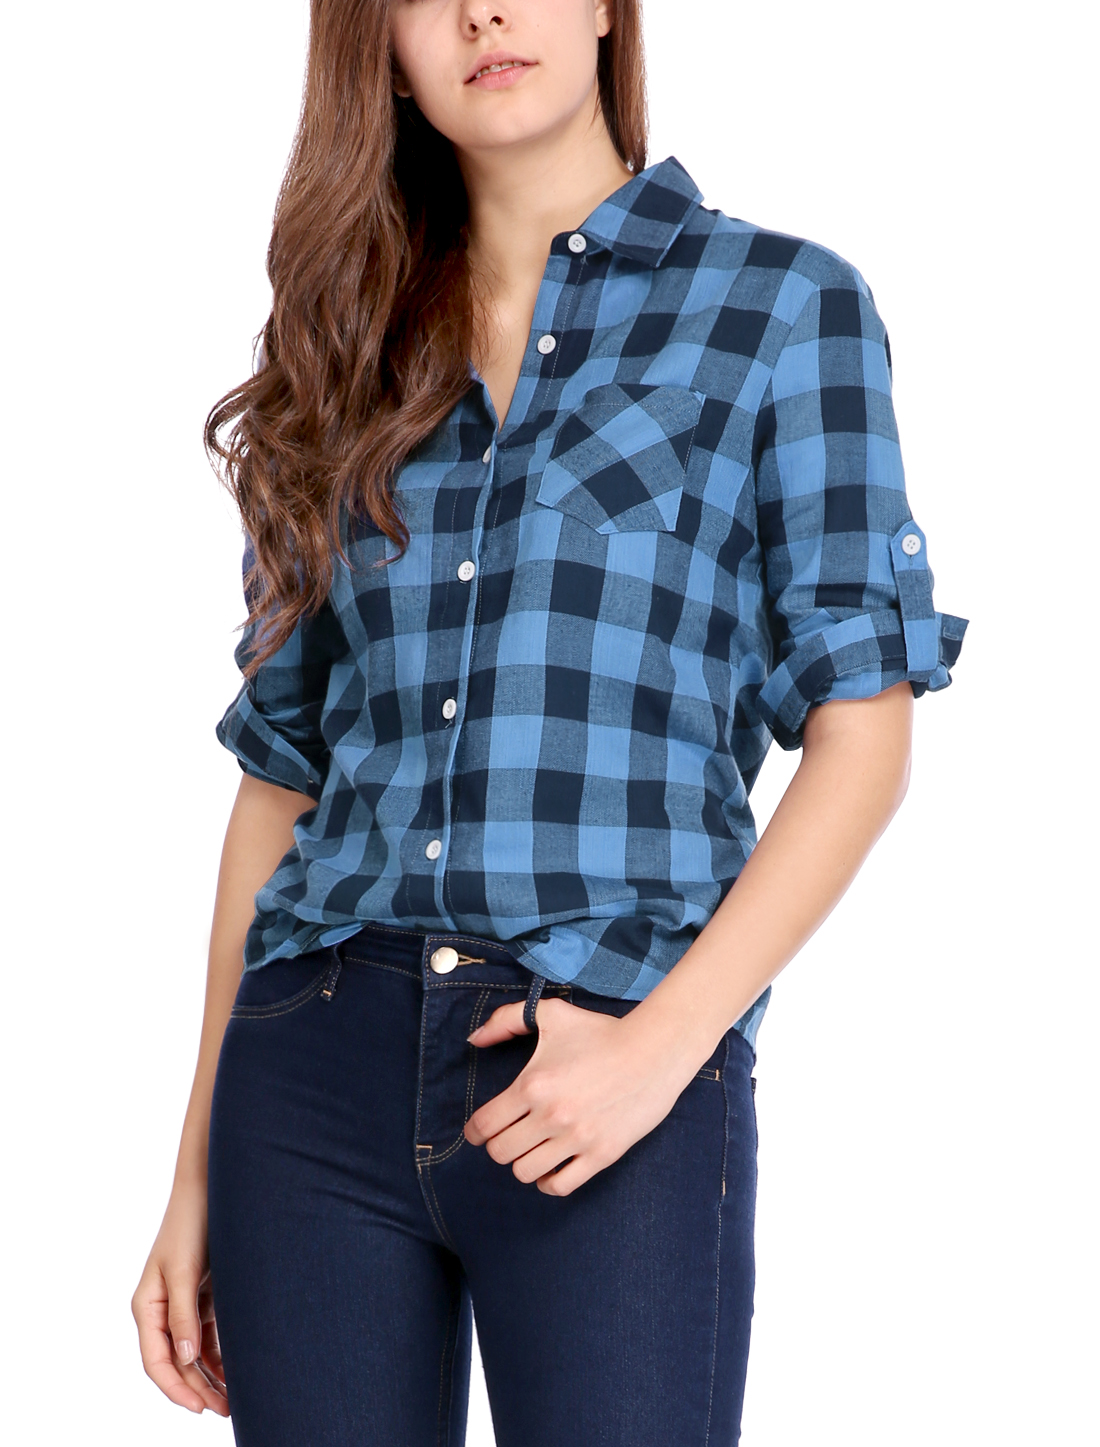 Allegra K Ladies Long Sleeves Button Placket Plaid Shirt Black Blue L